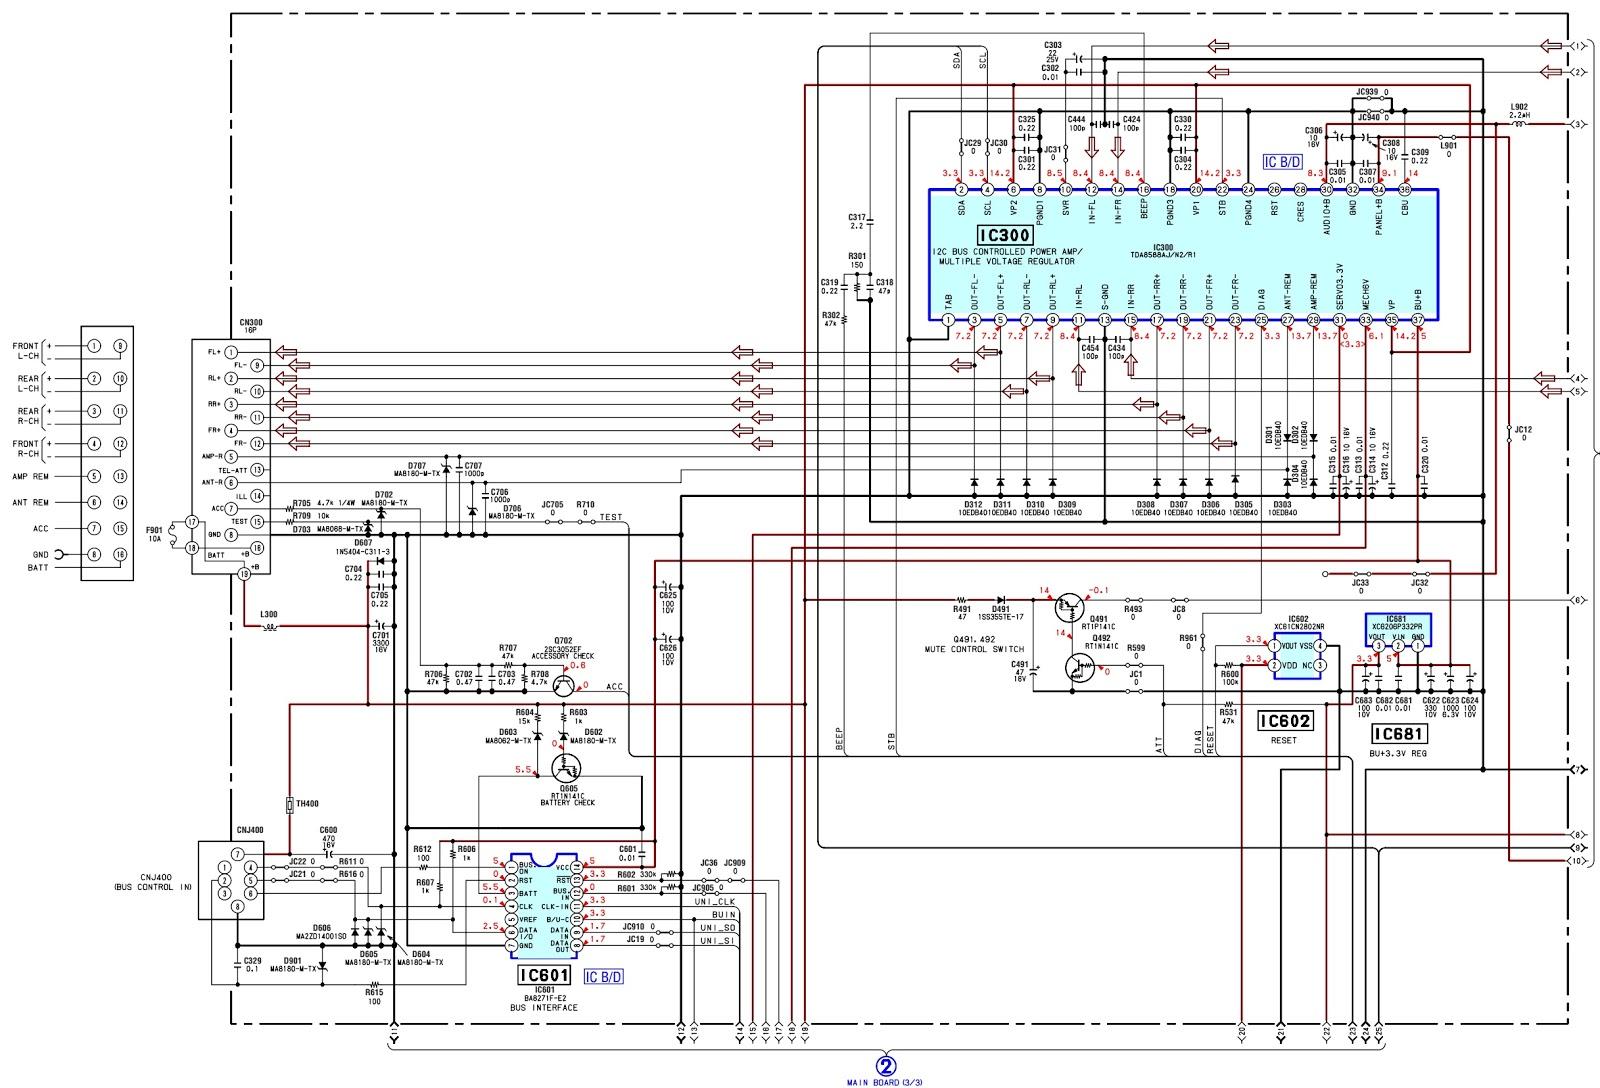 Sony Cdx Gt410u Wiring Diagram Porsche 996 Headlight 30 Images Fig 2 Gt41us Fm Am Compact Disc Player Schematic Circuit Gt420u